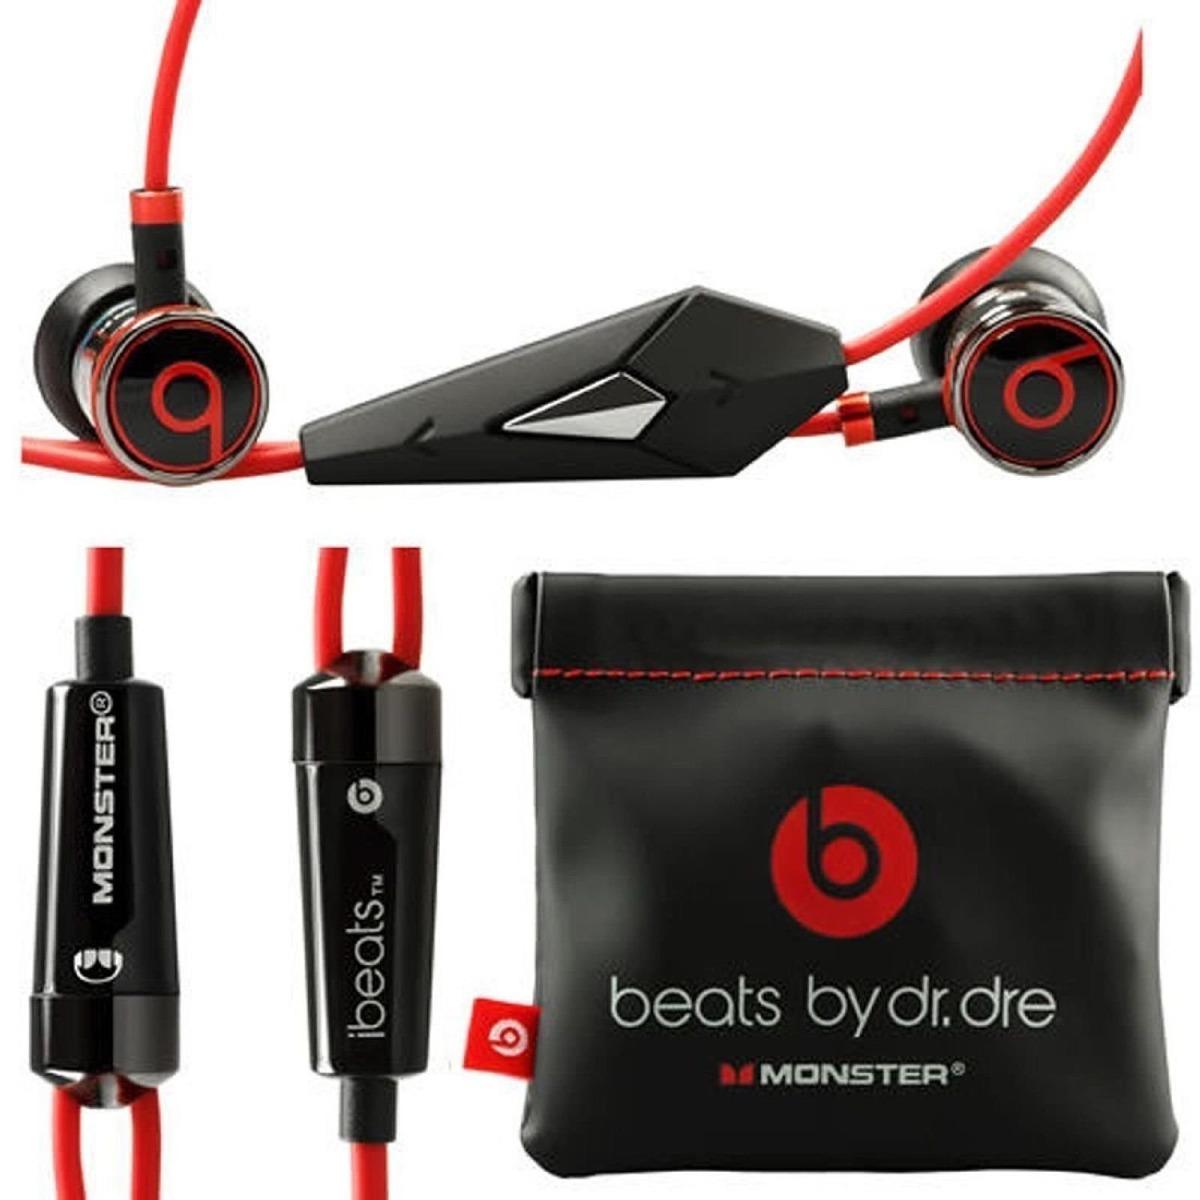 637ad946b67 monster beats de dr dre ibeats auriculares con controltal. Cargando zoom.